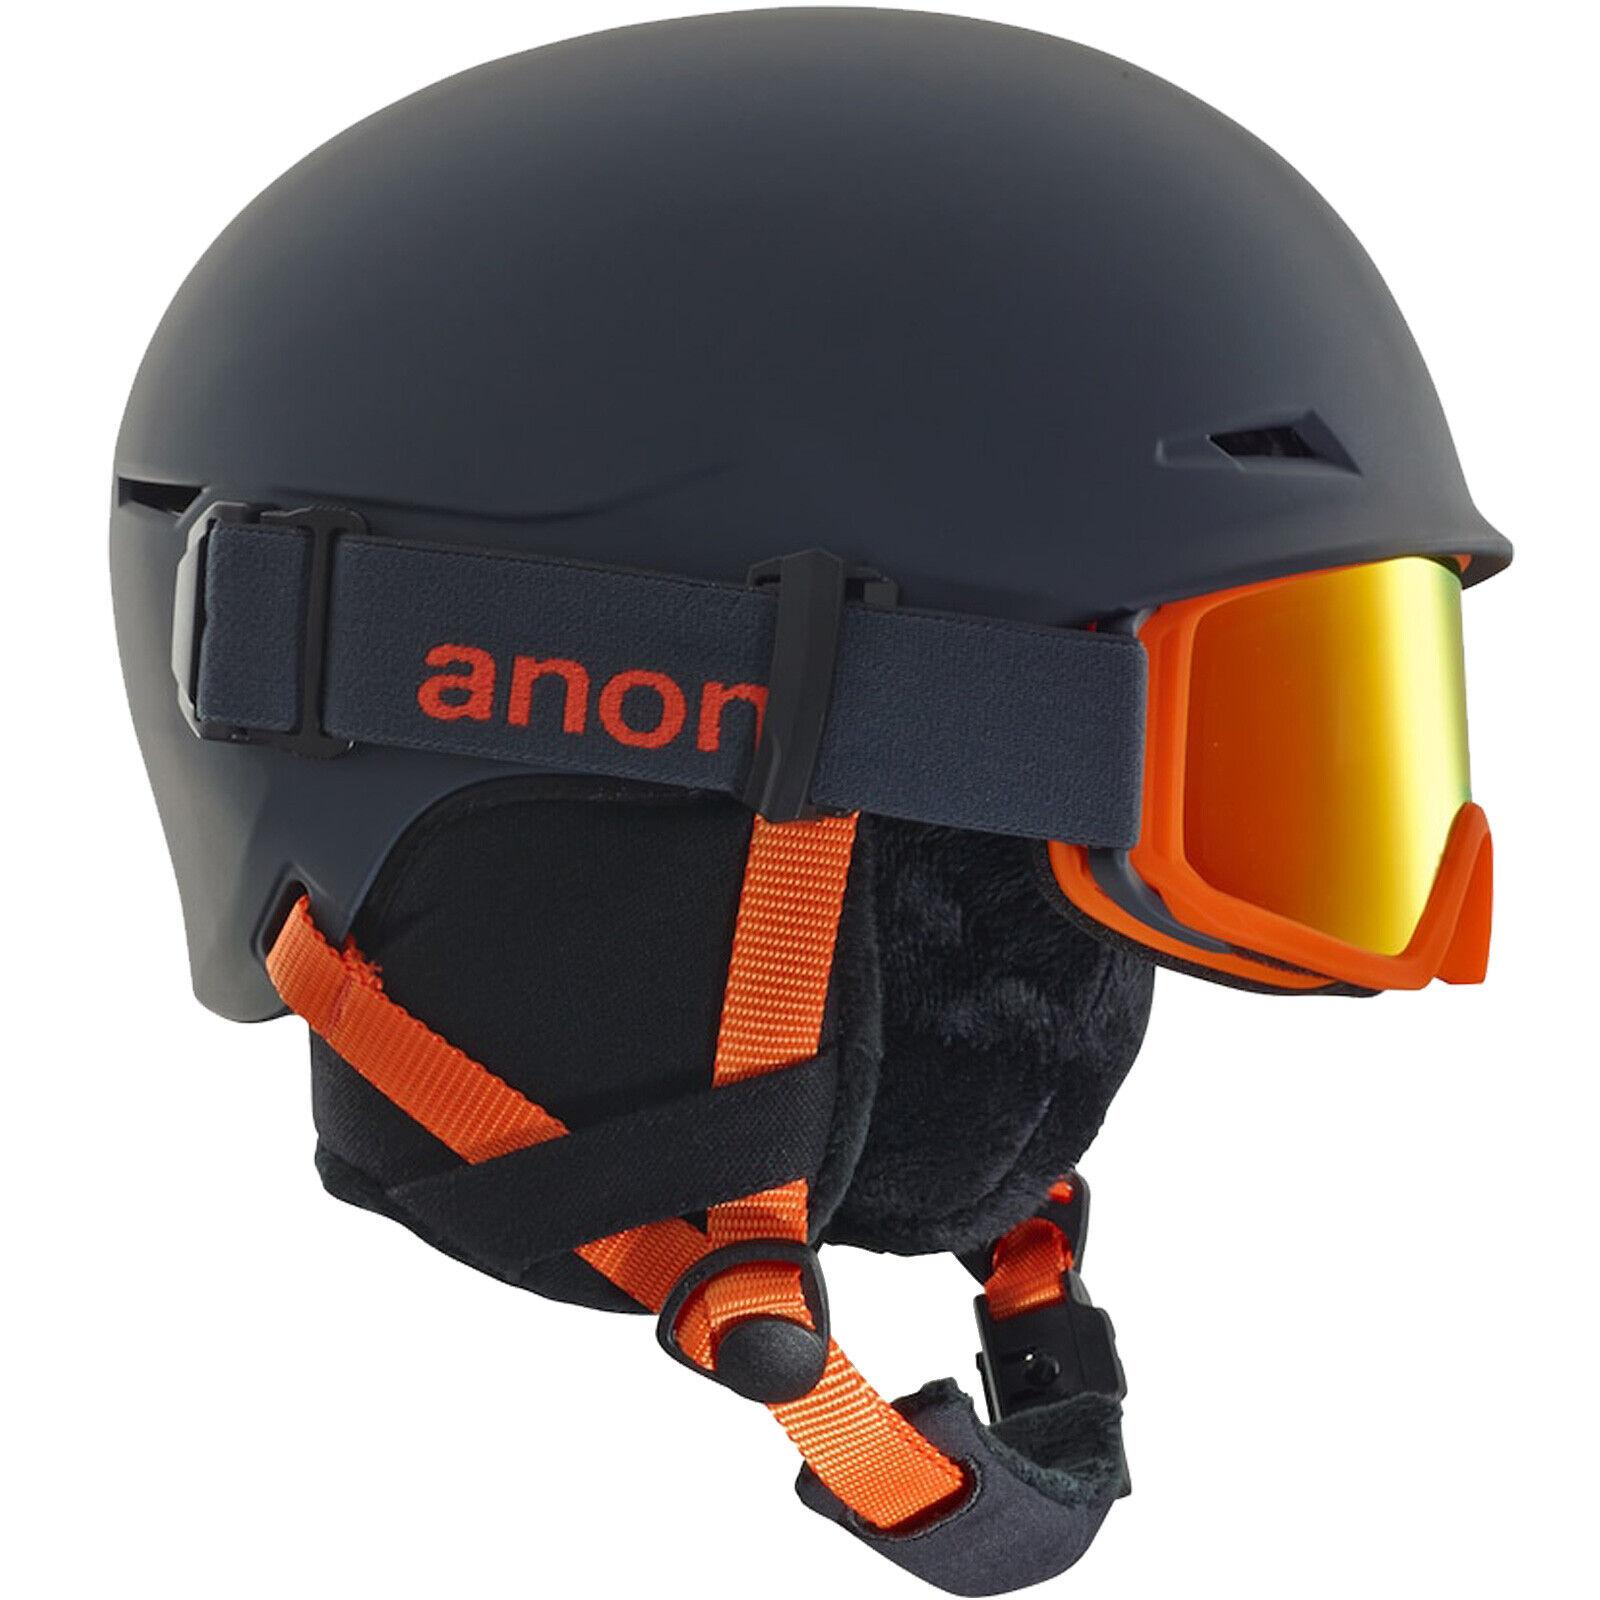 Anon Define Helm + Skibrille Kinderhelm Snowboardhelm Kinder-Skihelm Wintersport